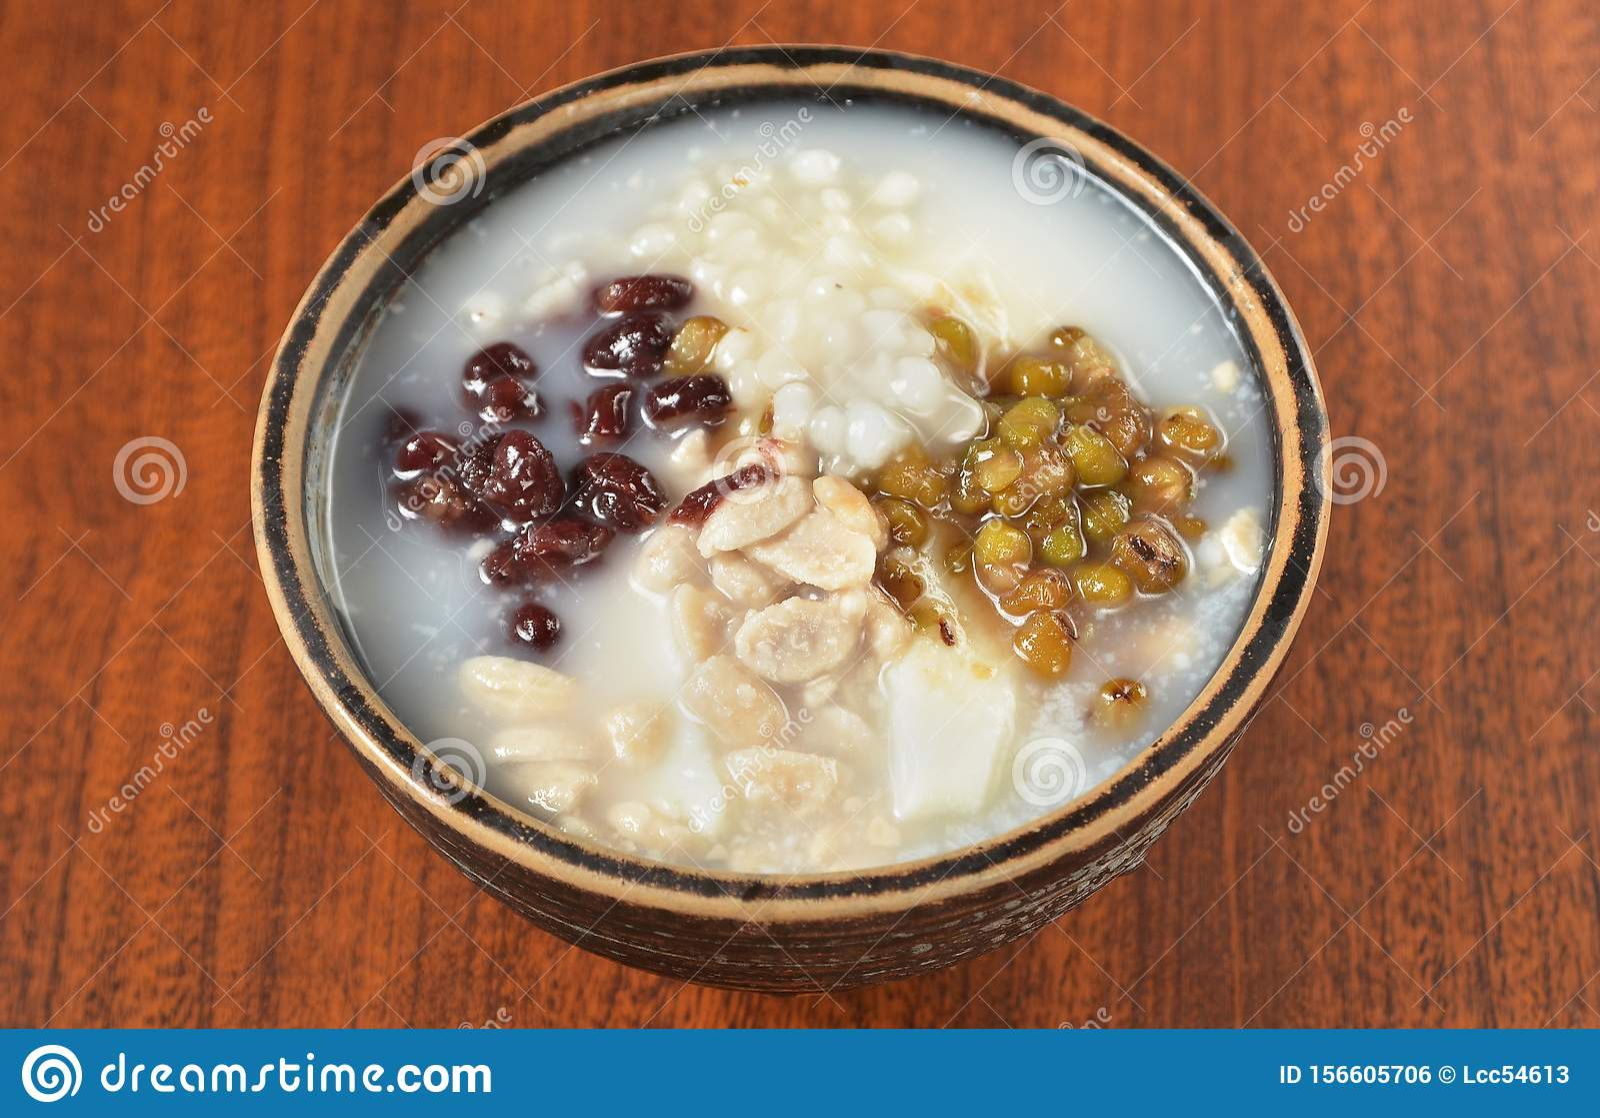 Comprehensive bean curd pudding